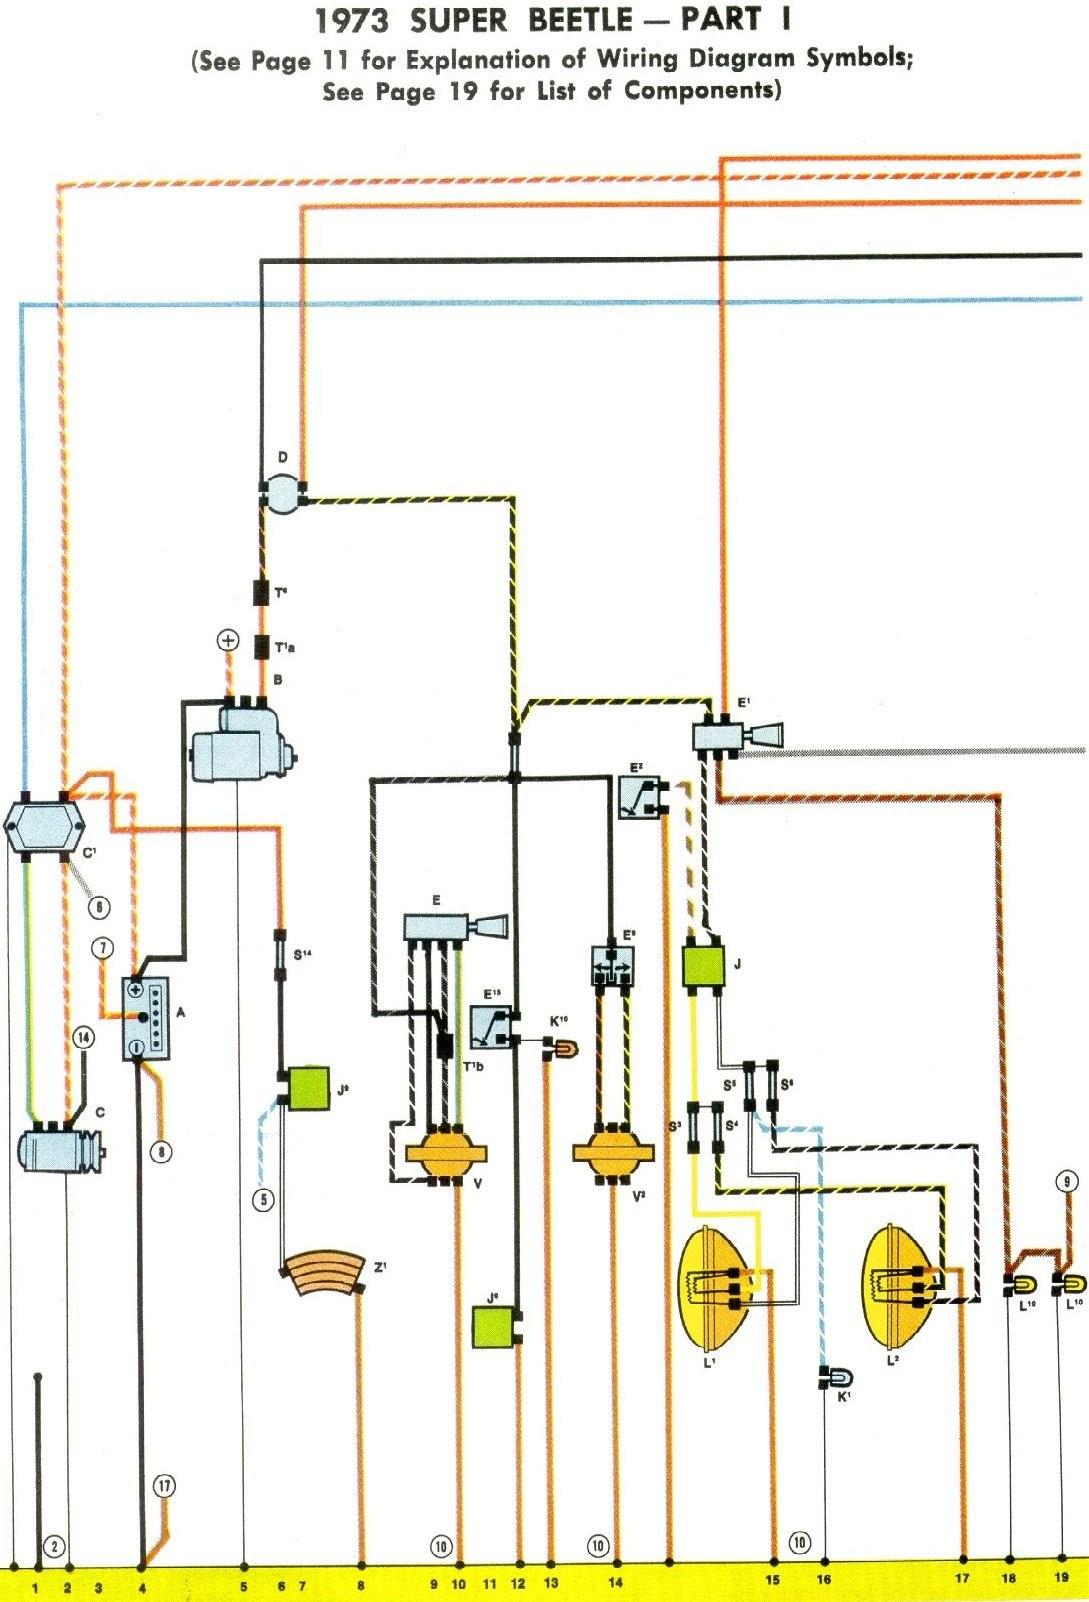 1973 Super Beetle Wiring Diagram Thegoldenbug 1973 Vw Super Beetle Wiring Diagram 1 1973 Vw Super Beetle Wiring Diagram